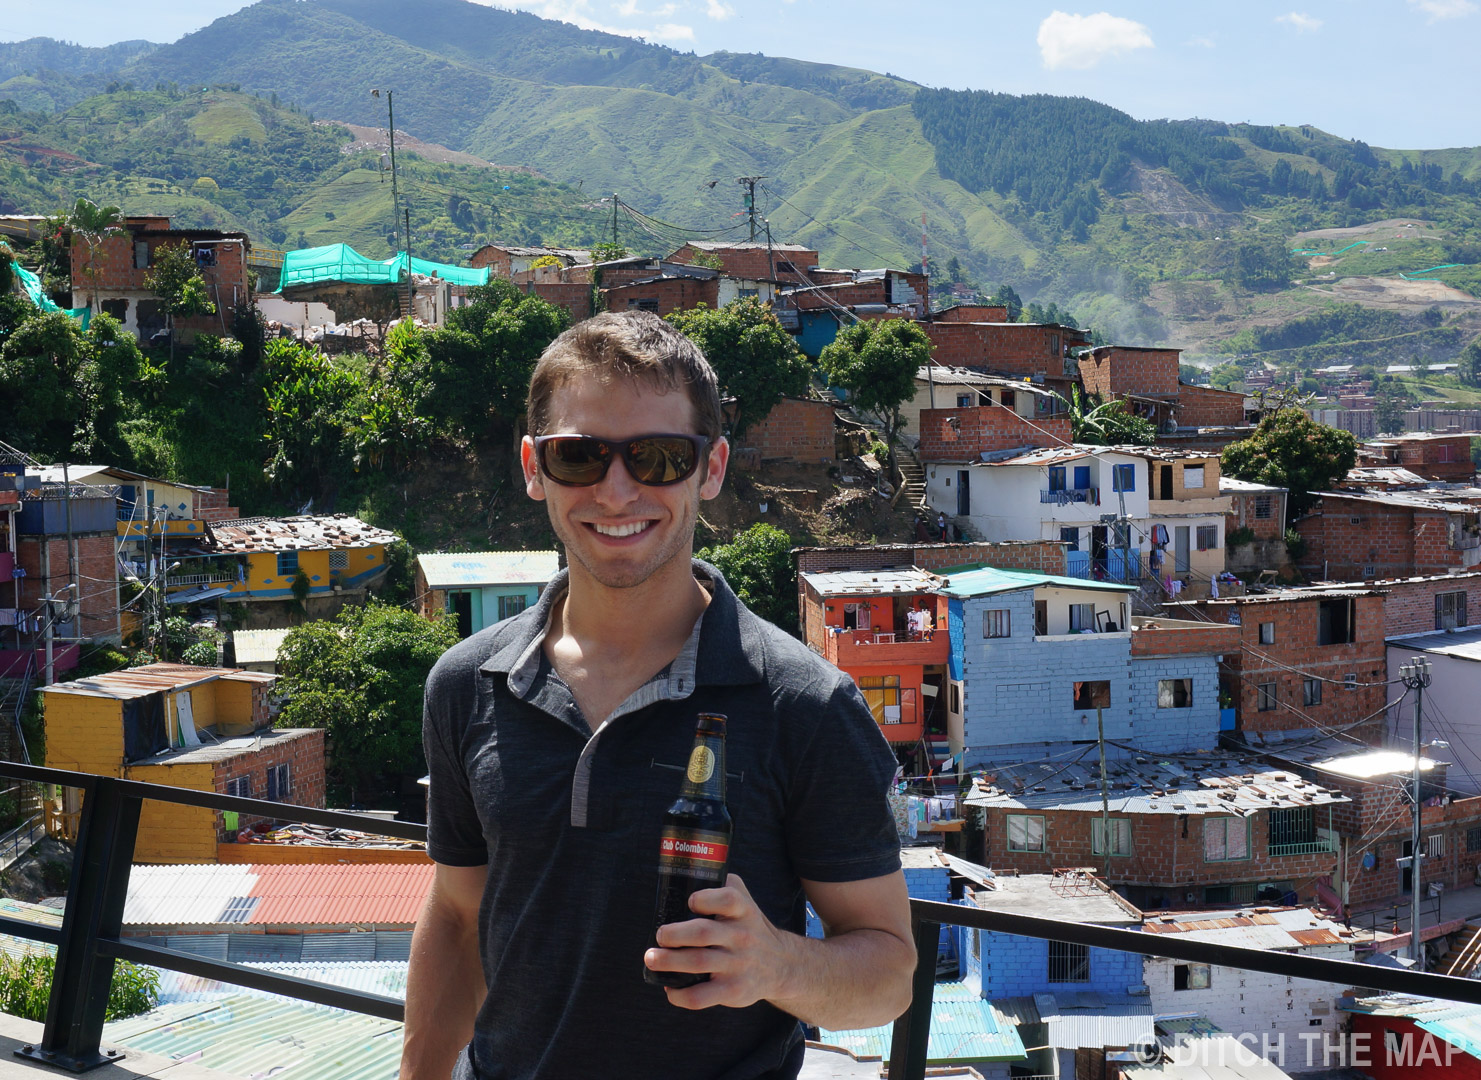 Enjoying a beer in Medellin, Colombia